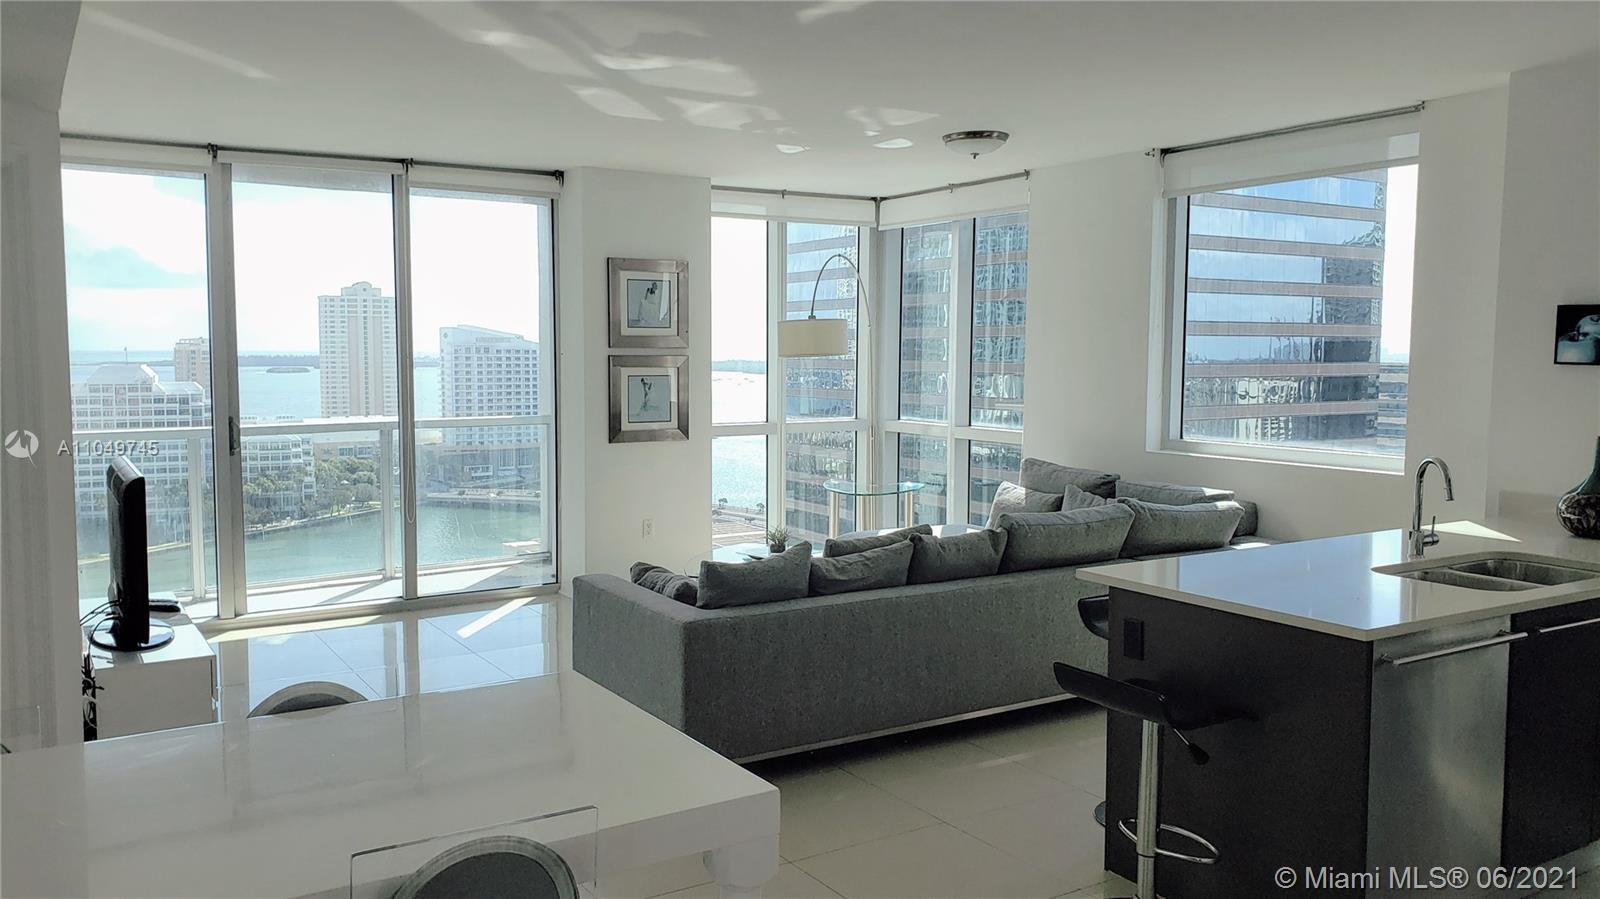 500 Brickell West Tower #1902 - 500 Brickell Ave #1902, Miami, FL 33131